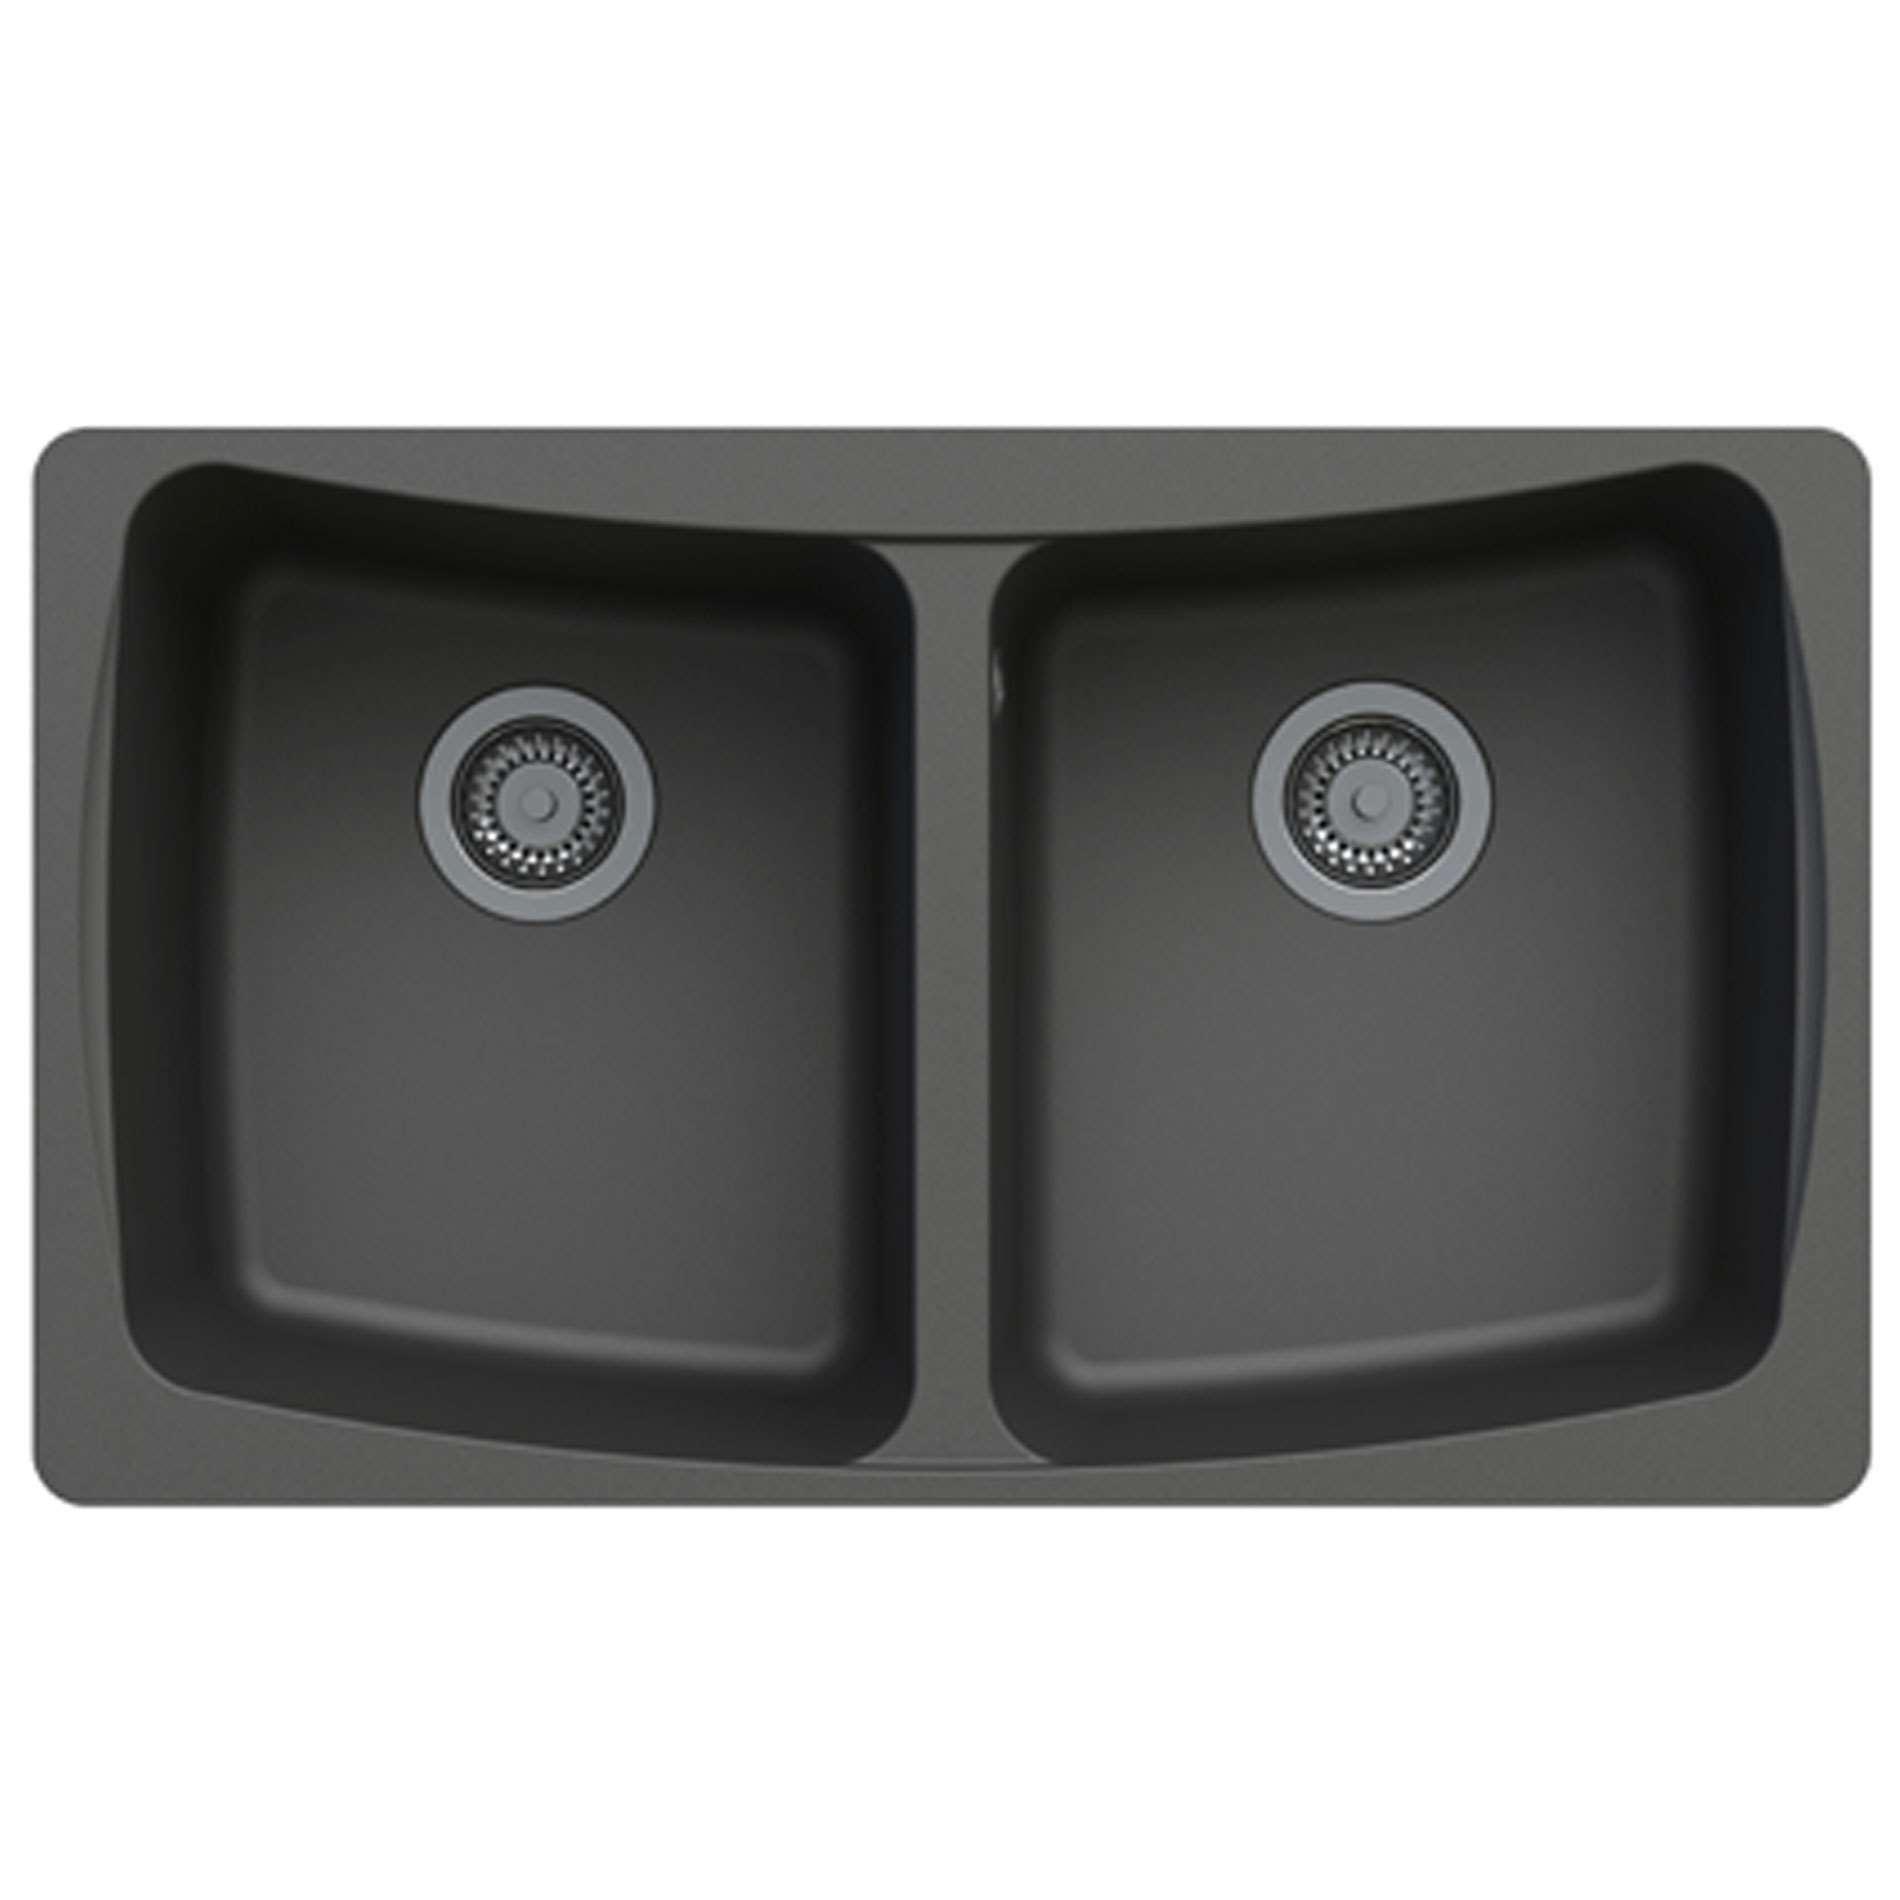 Rok Granite Sinks : ... Malham 2.0 Bowl Volcano Black ROK Granite Sink - Kitchen Sinks & Taps